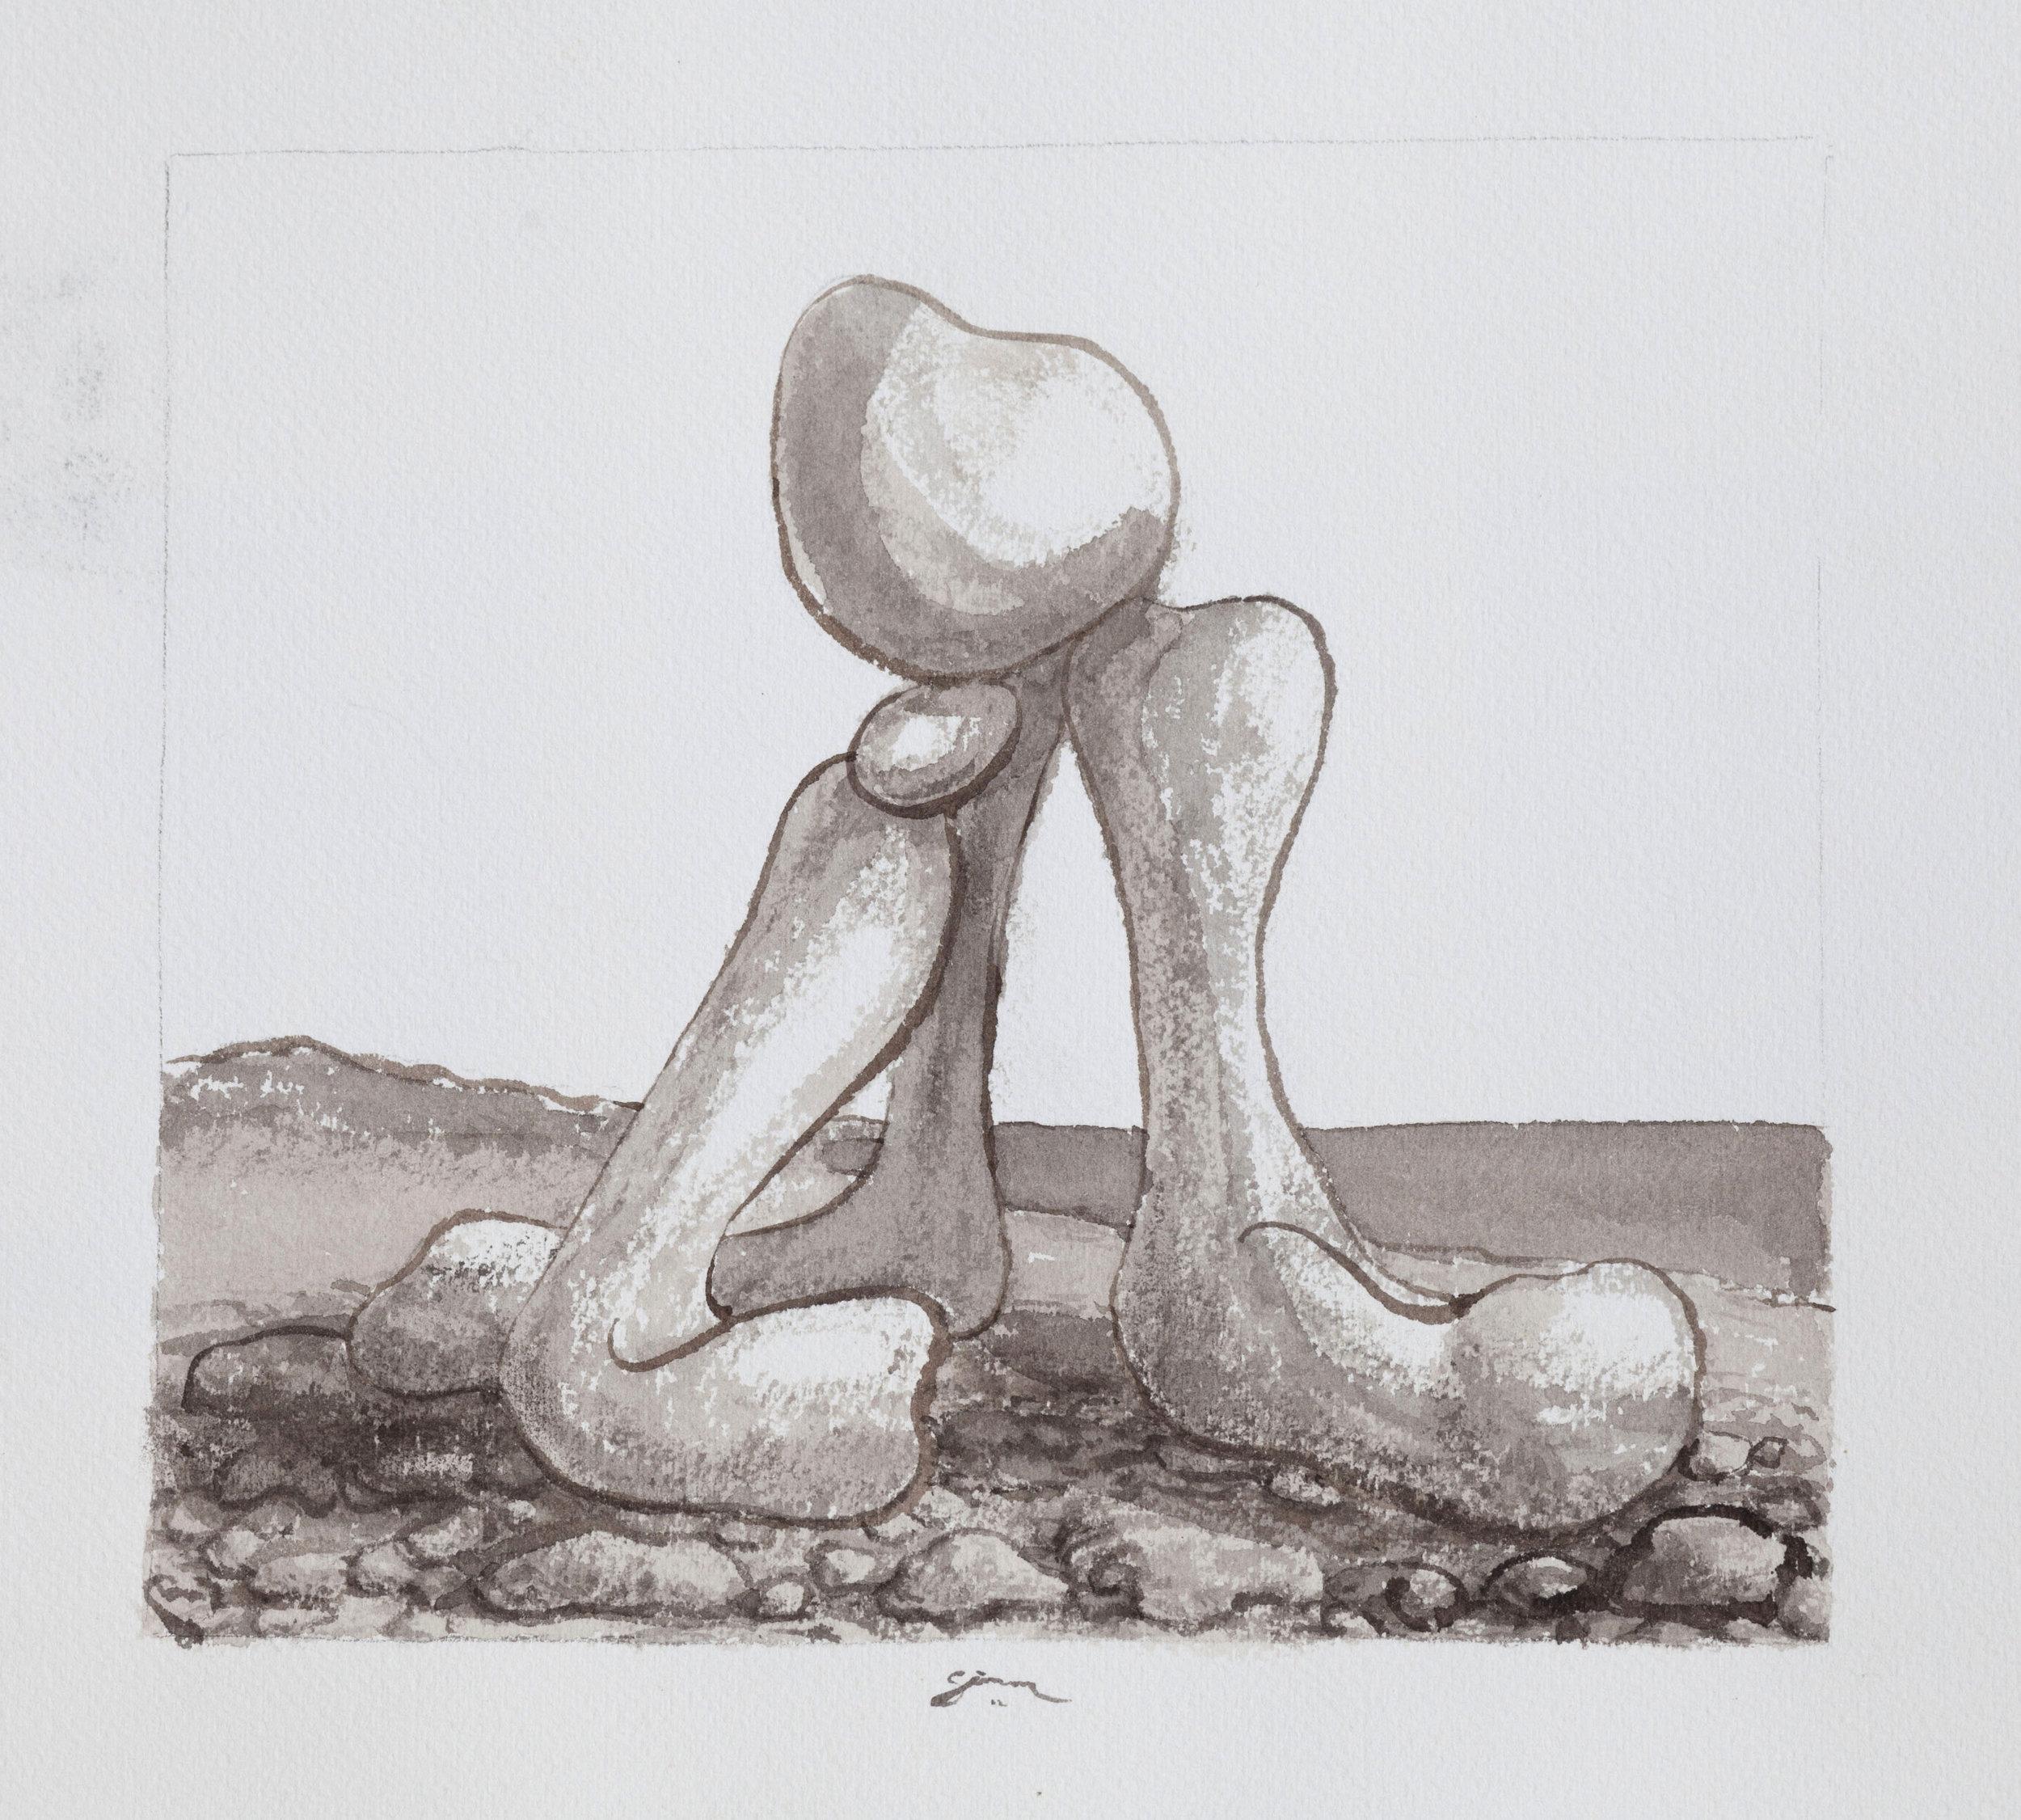 Figure on a stoney beach